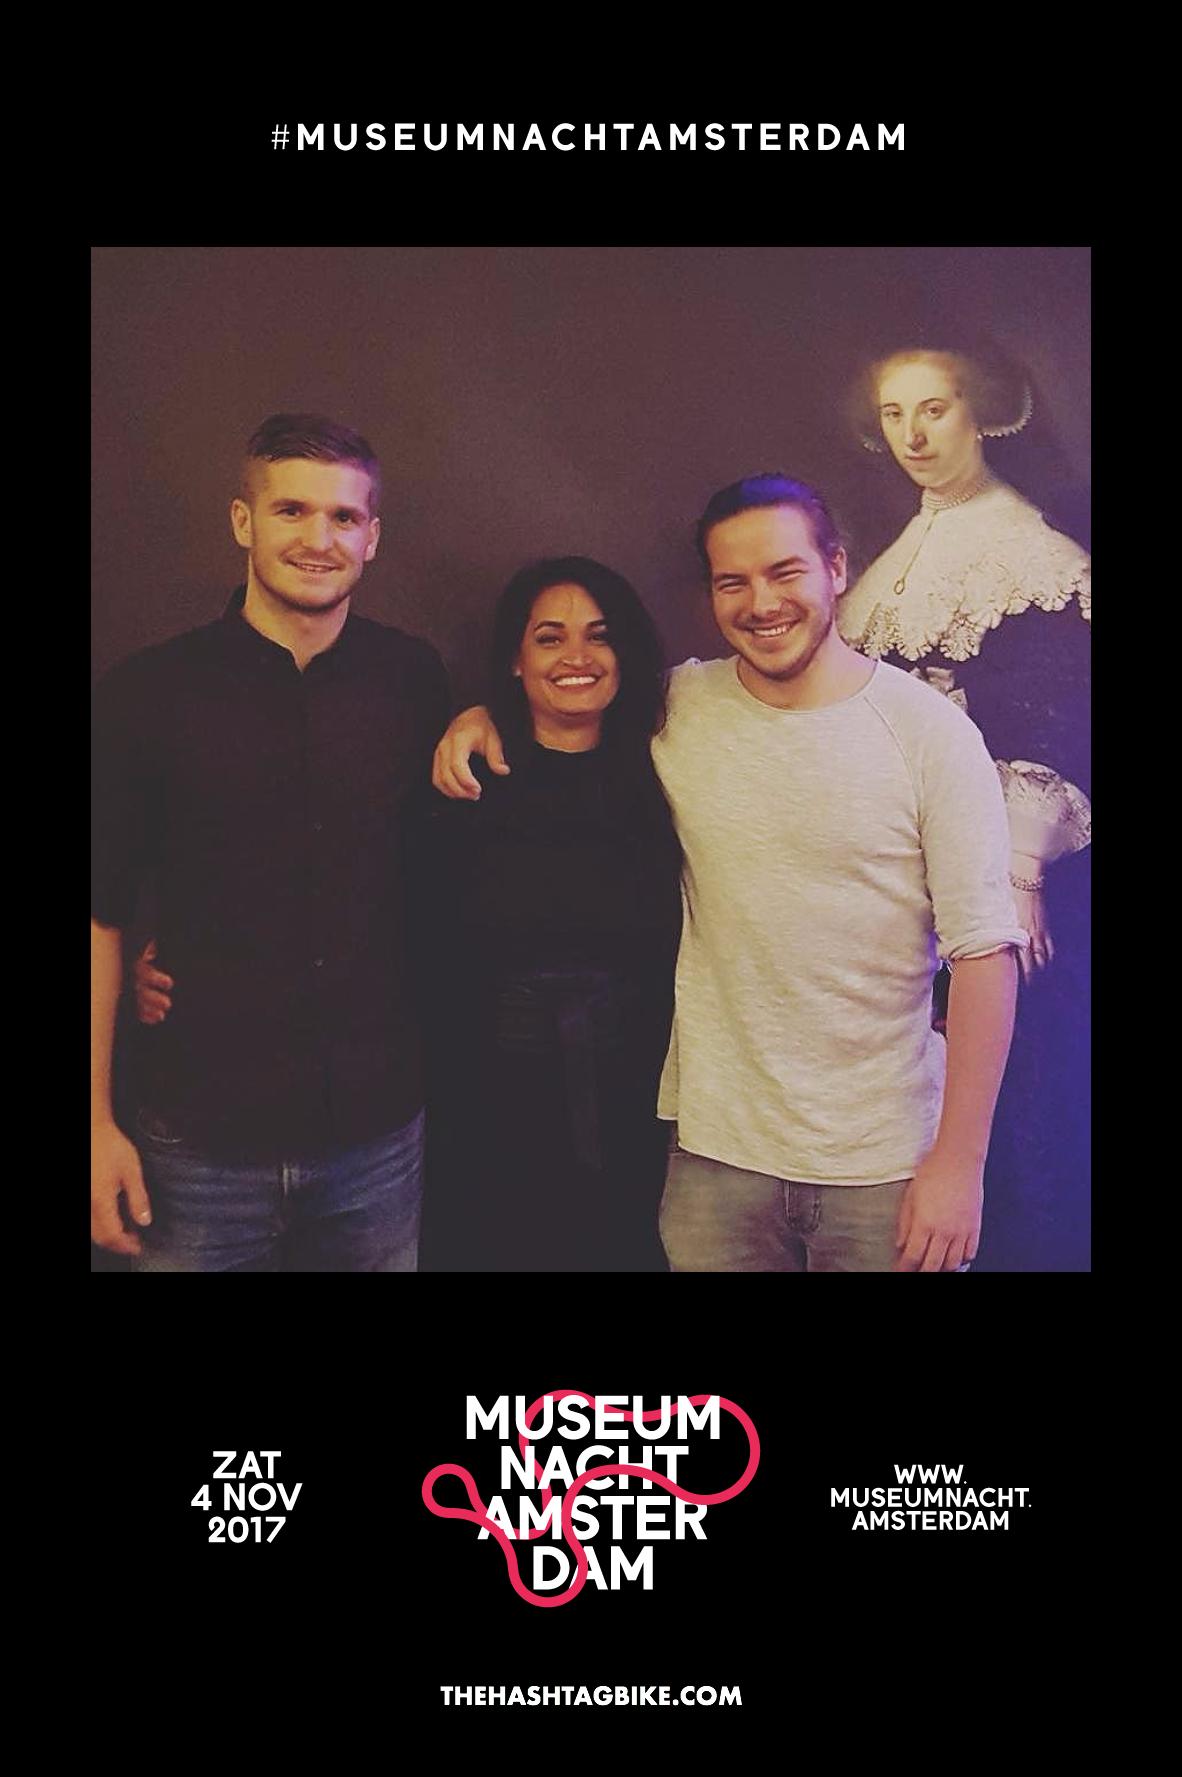 museumnacht_thehashtagbike15.png